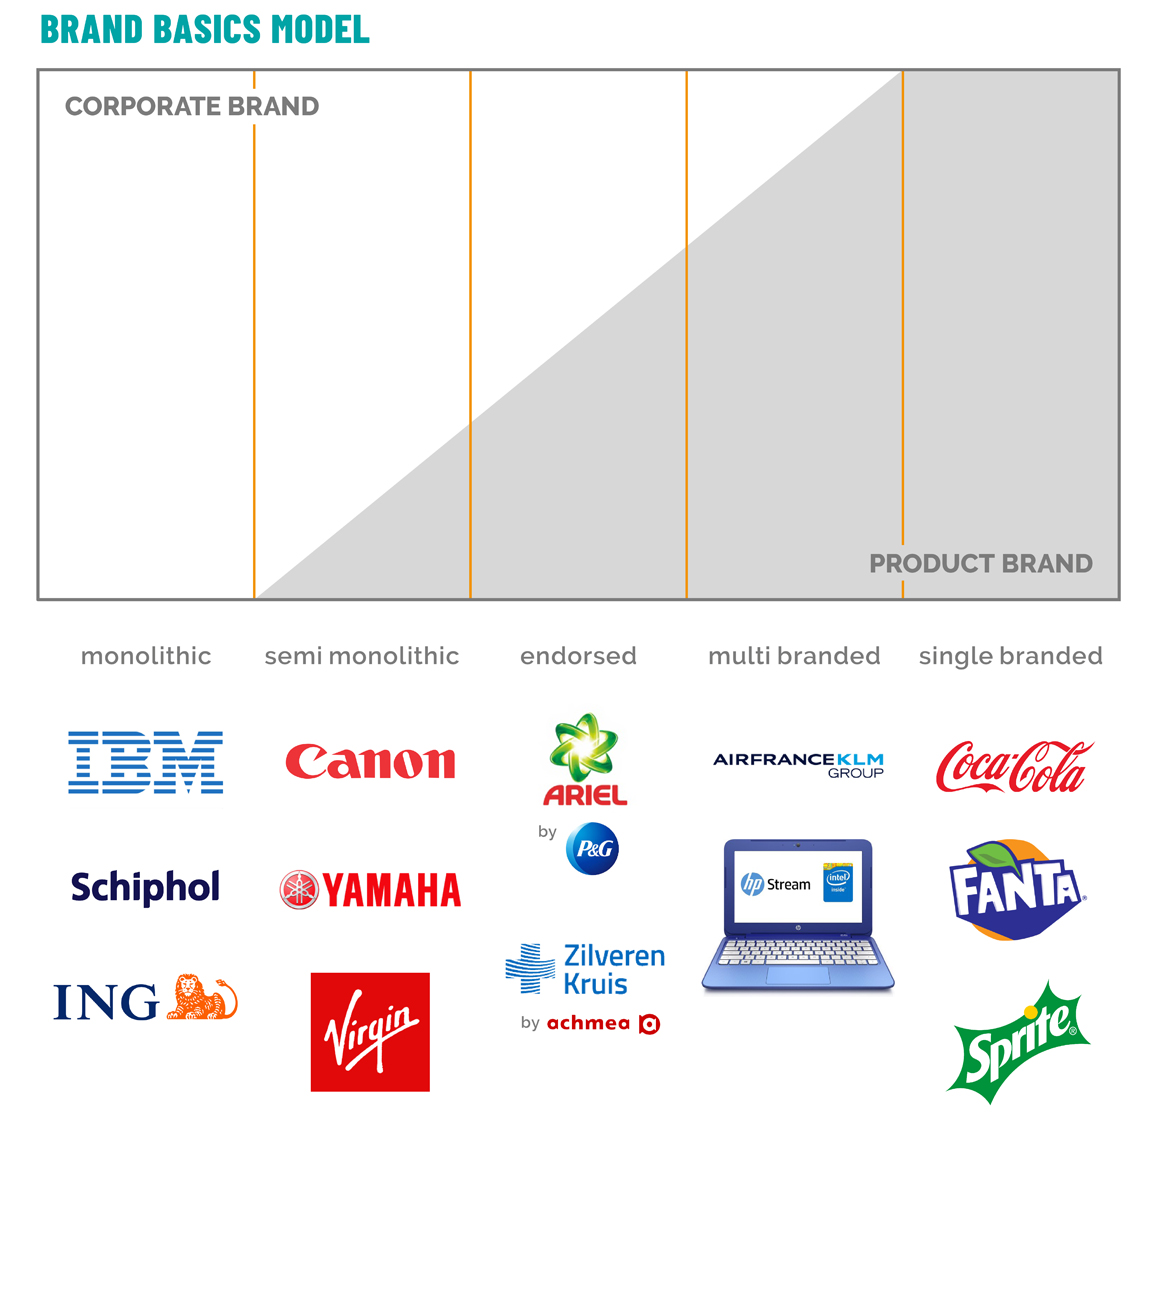 Corporate Identity Brand Basic Model BTM